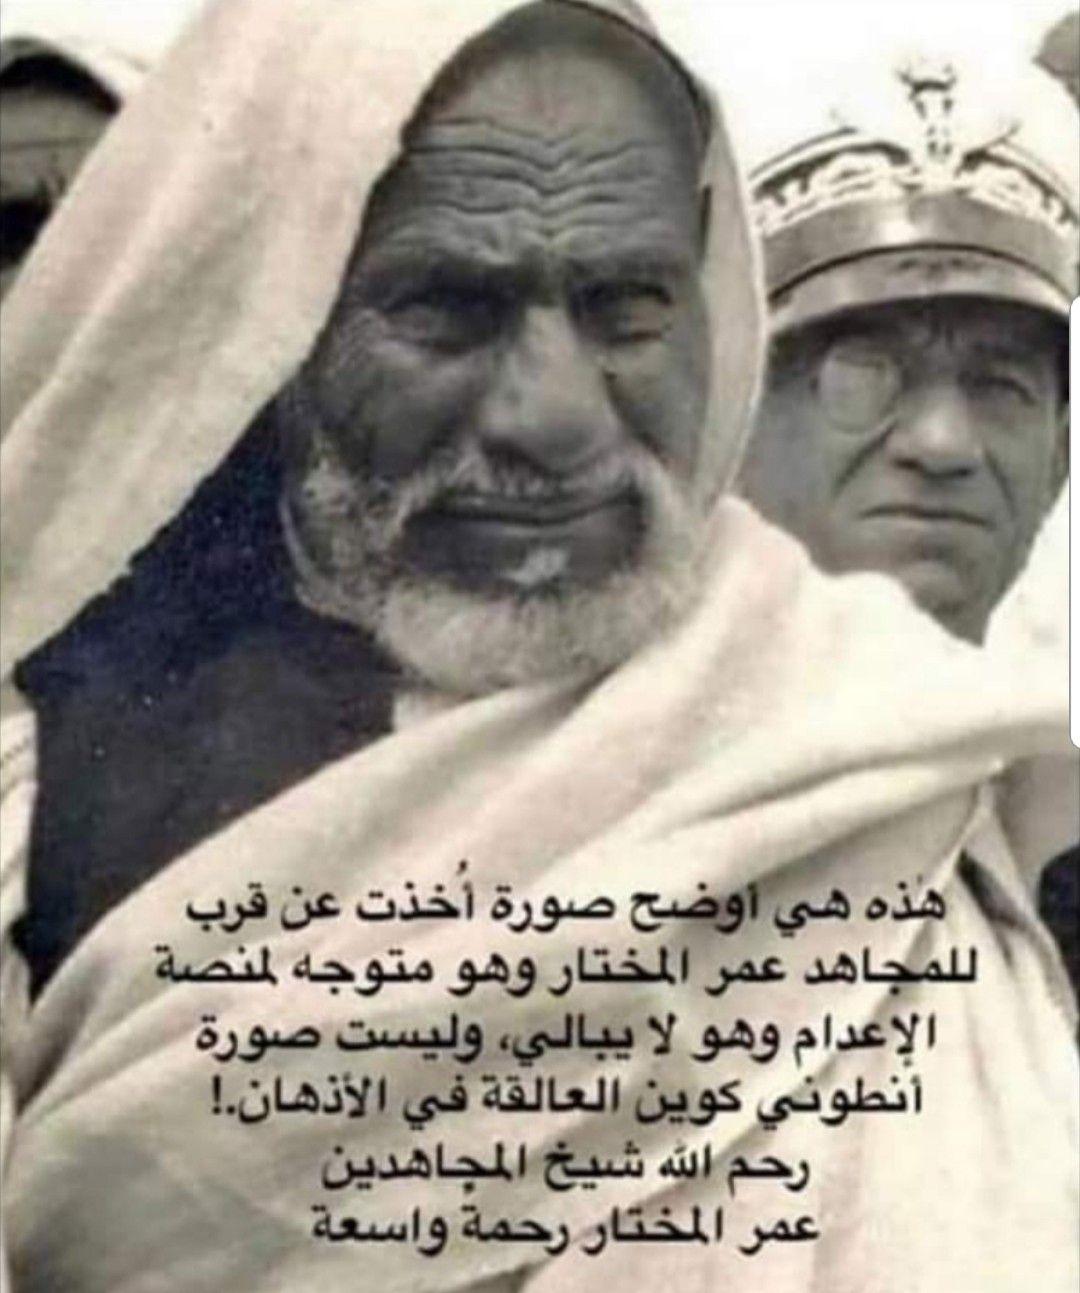 Pin By Gamila El Zein On كلمات Beautiful Arabic Words Islamic Quotes Islam Beliefs